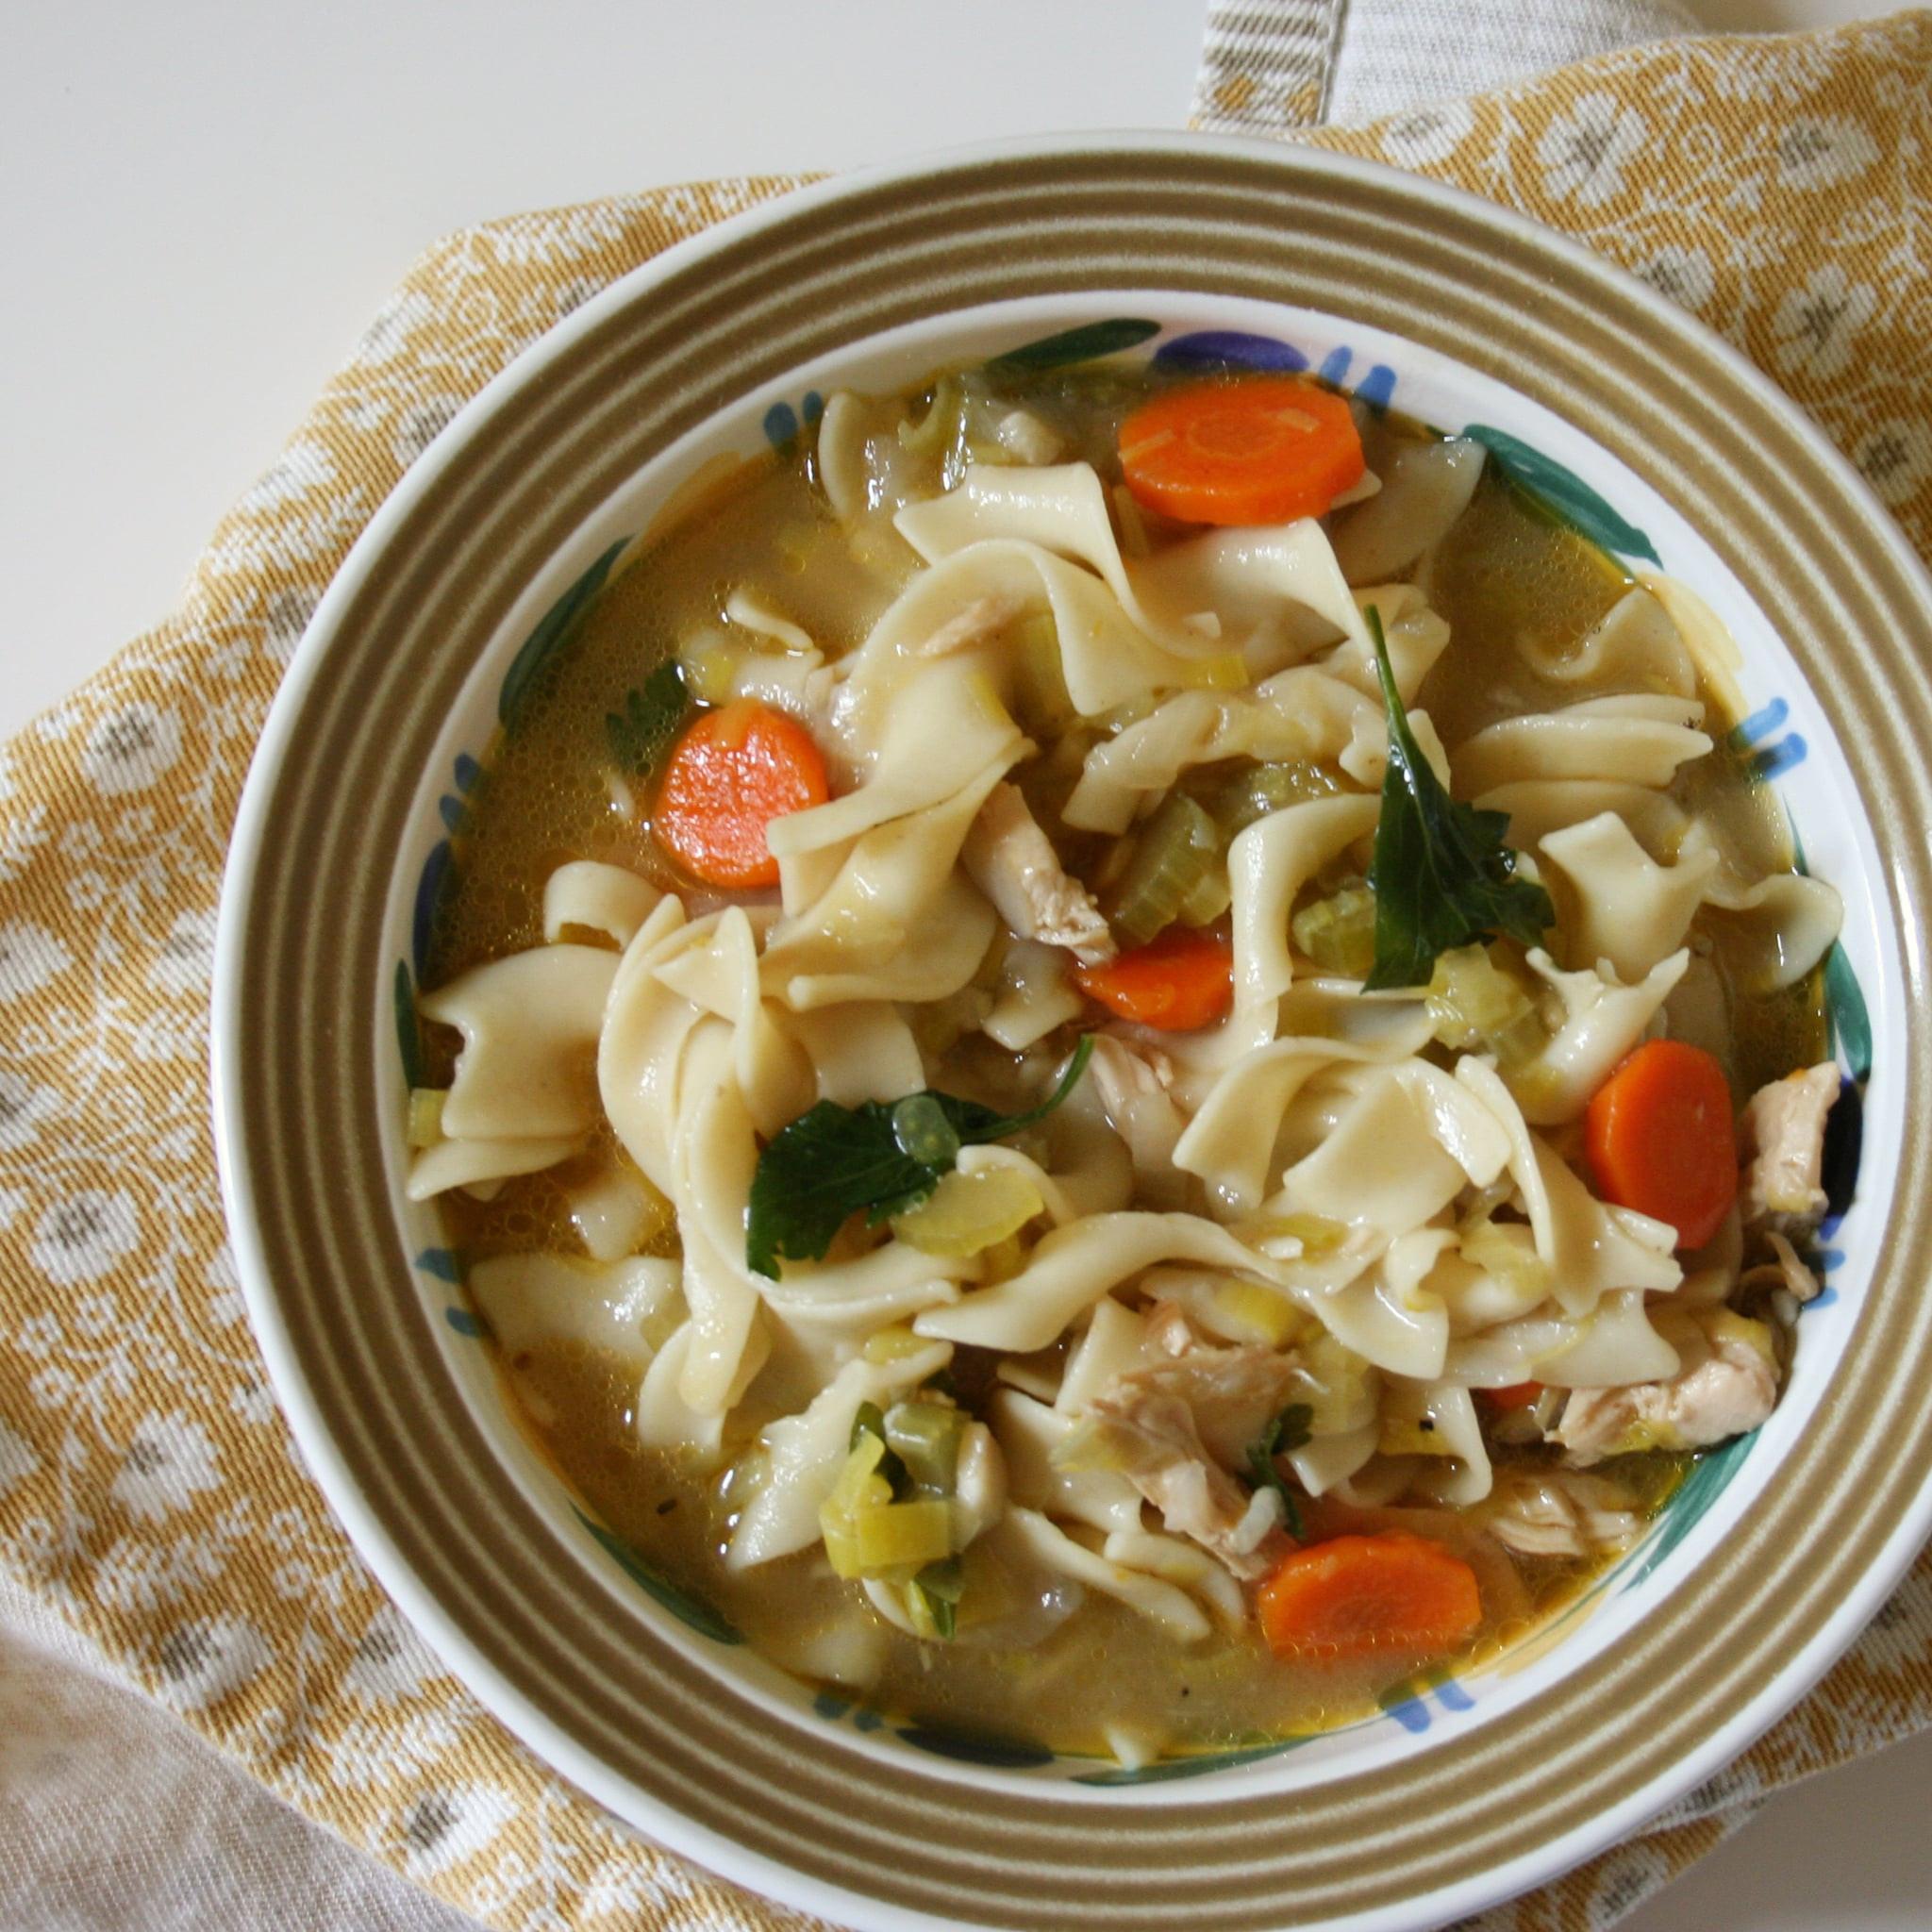 Best Chicken Noodle Soup  Food Network Chicken Noodle Soup Recipes